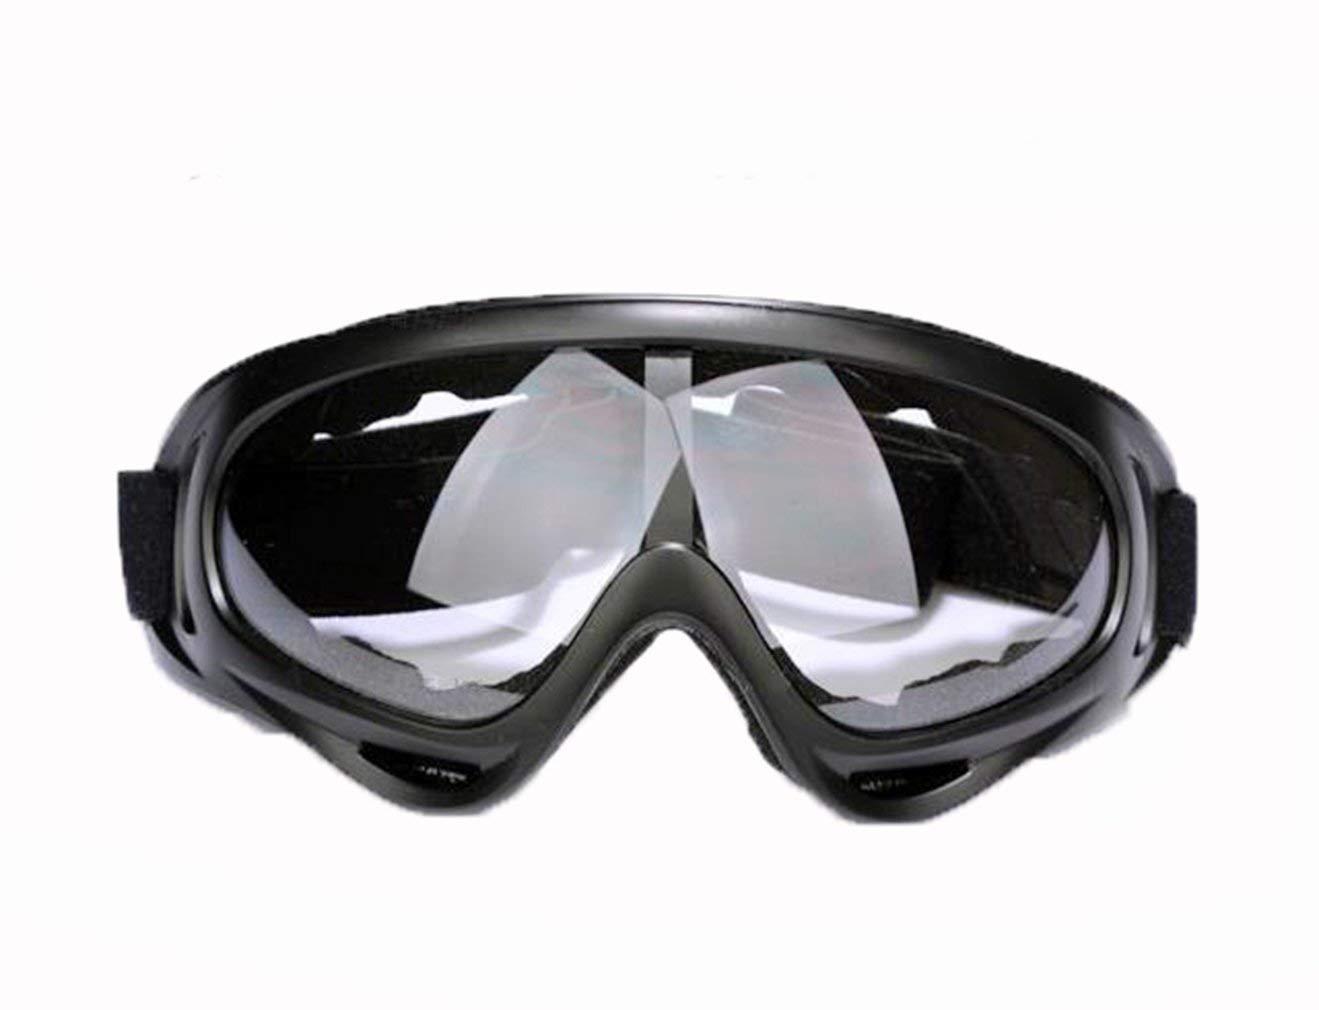 4fae4e811684 Get Quotations · S-SPORTS Ski Goggles